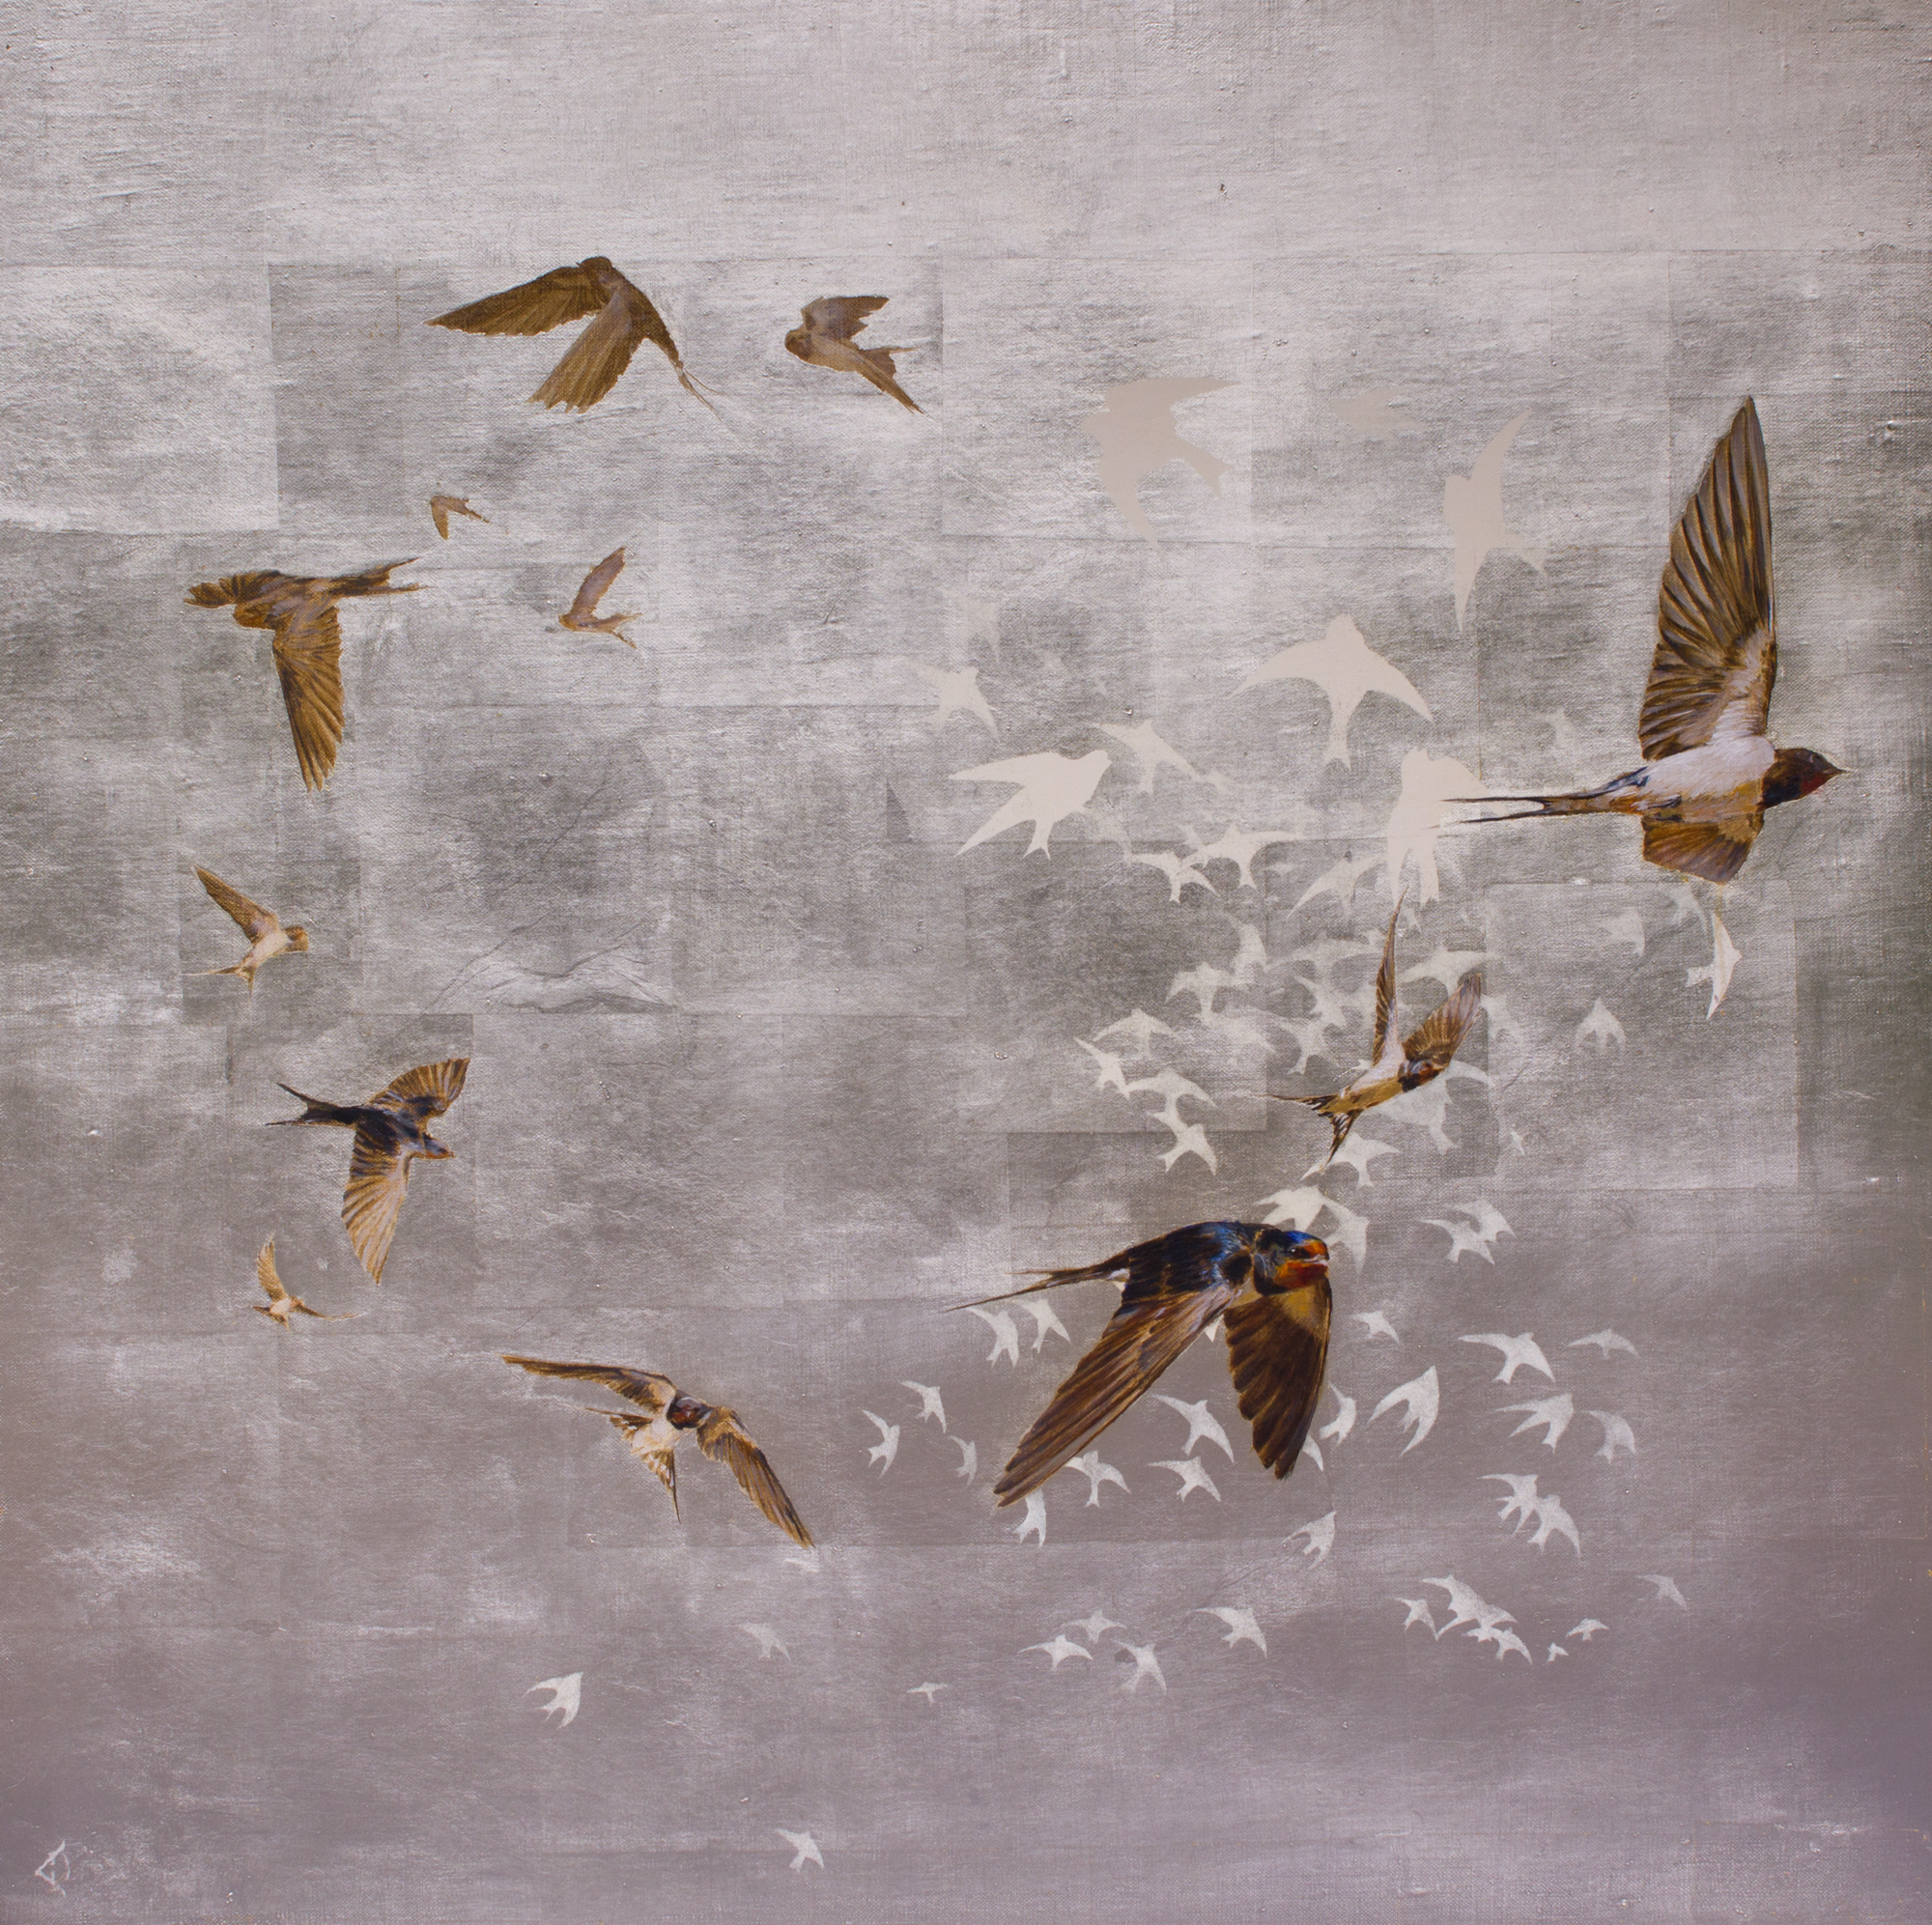 Swallows Return